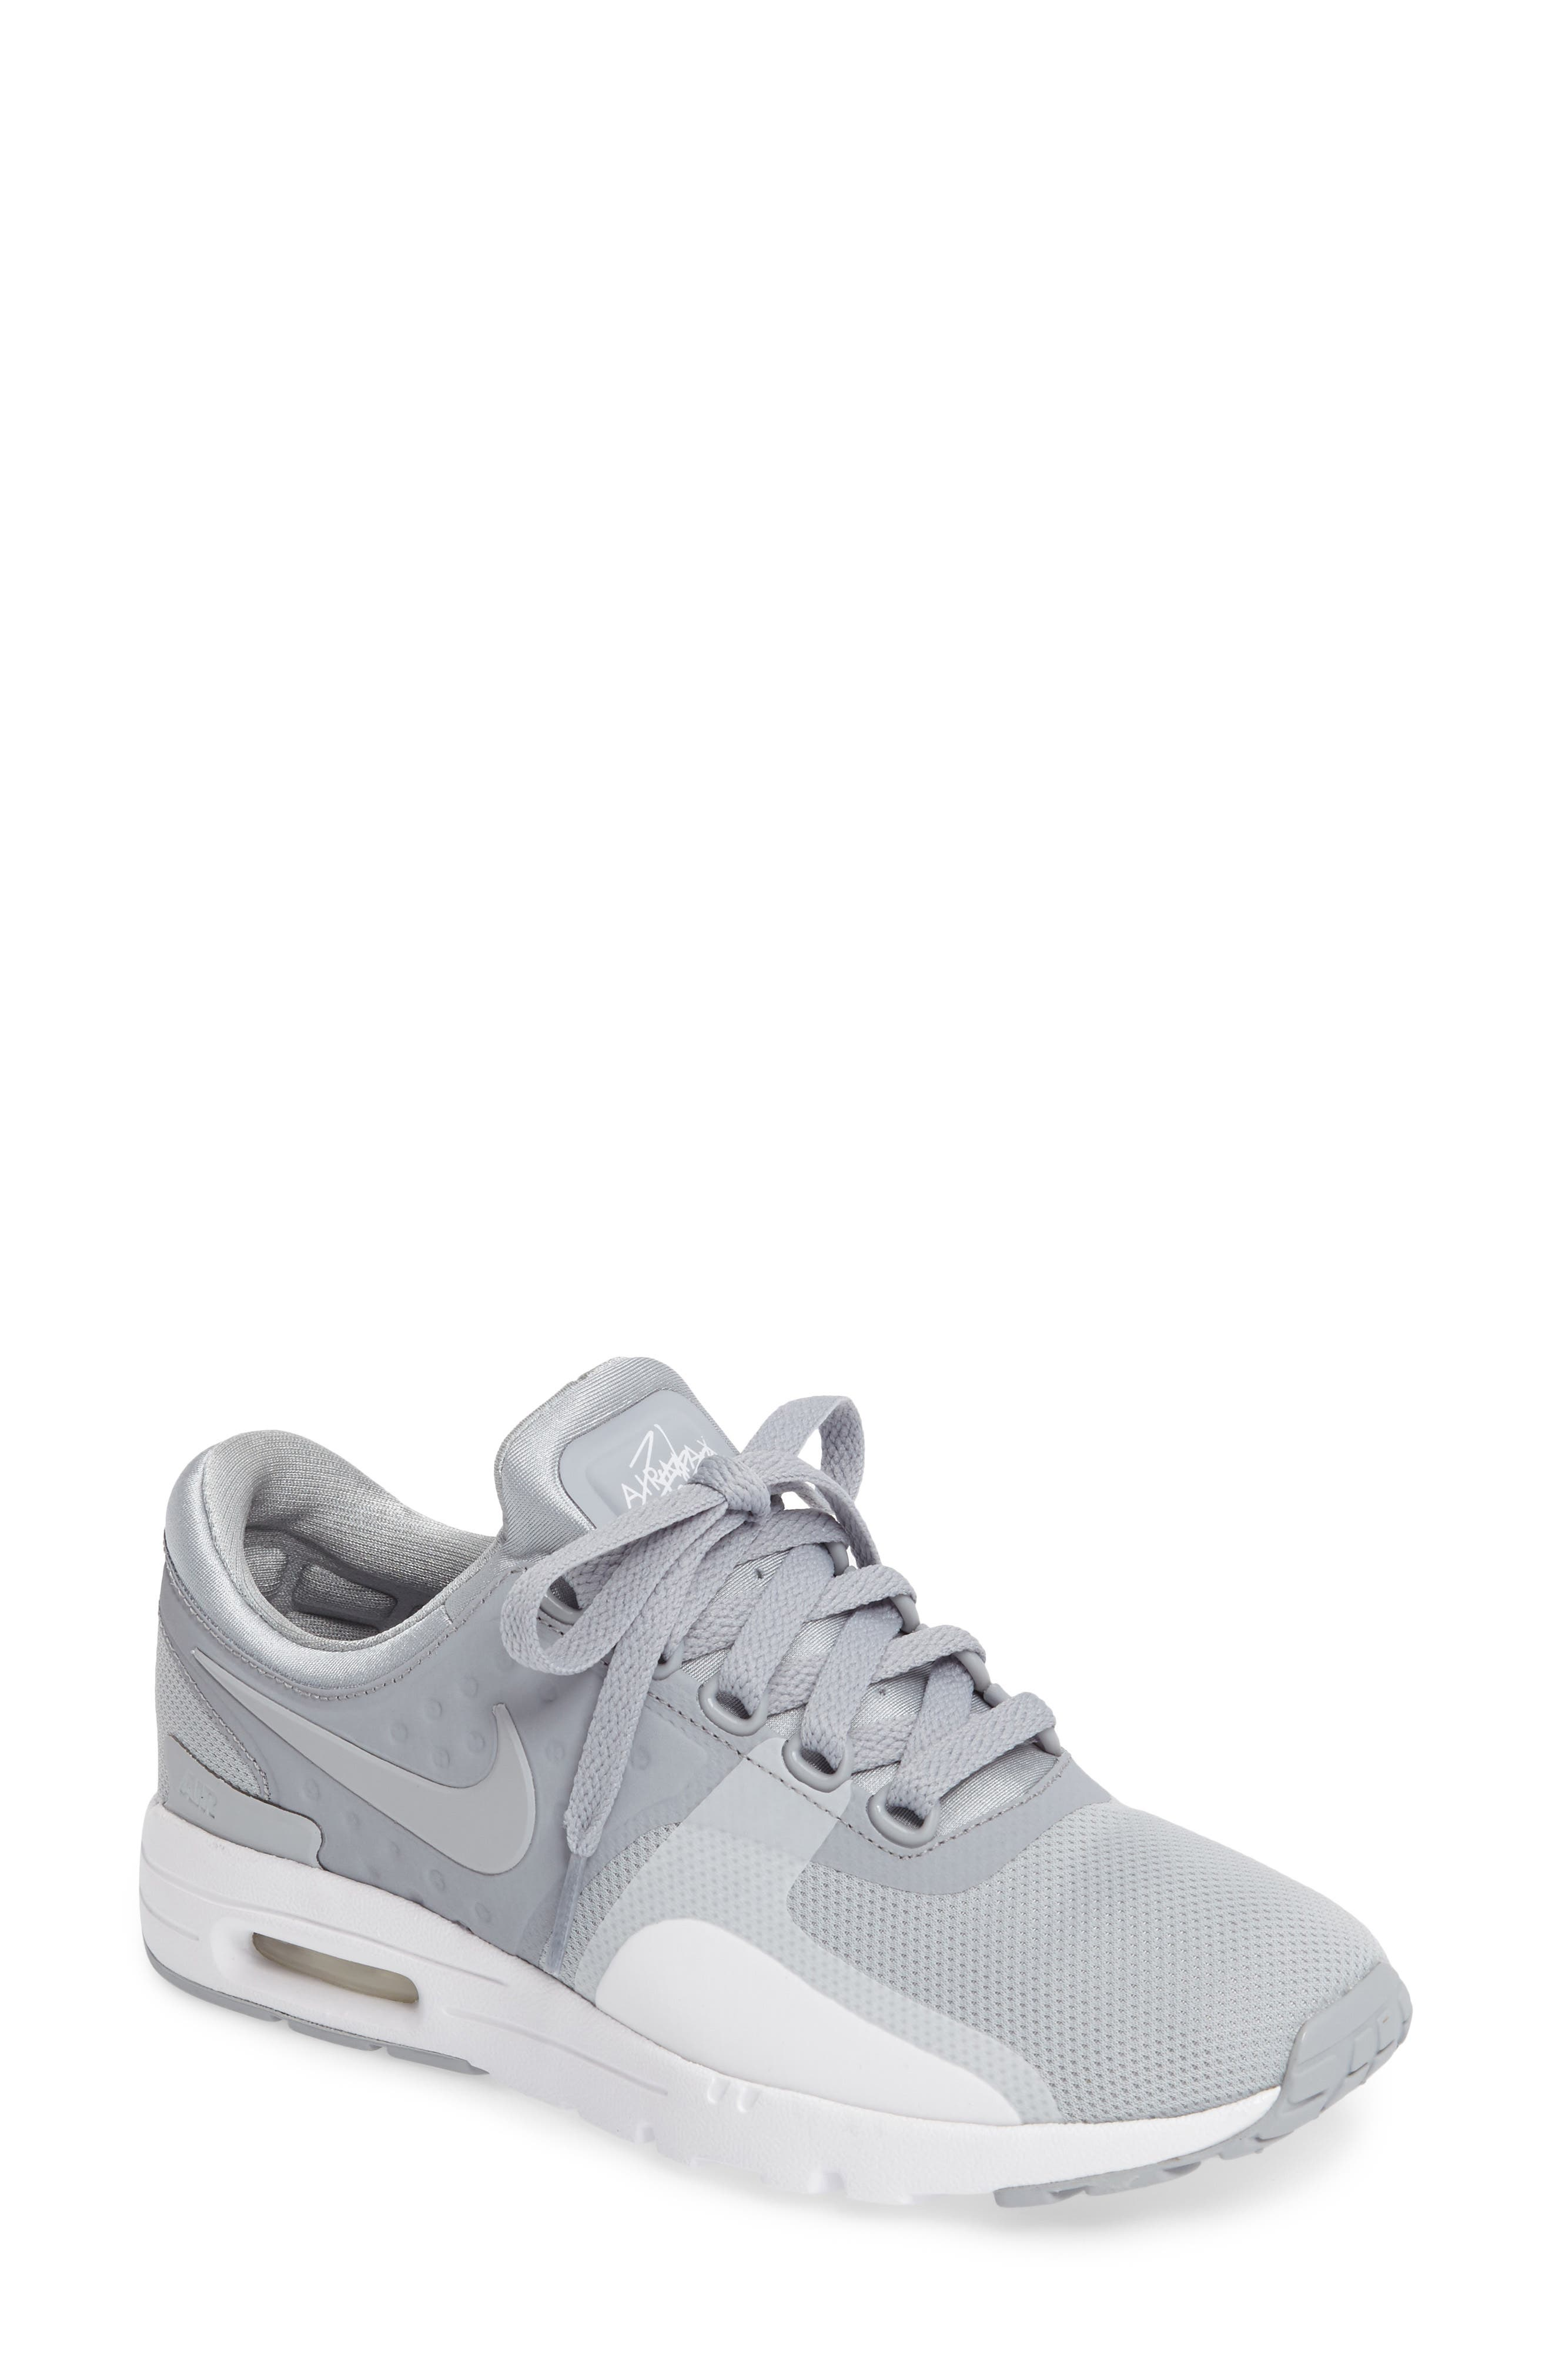 Air Max Zero Sneaker,                         Main,                         color, 020